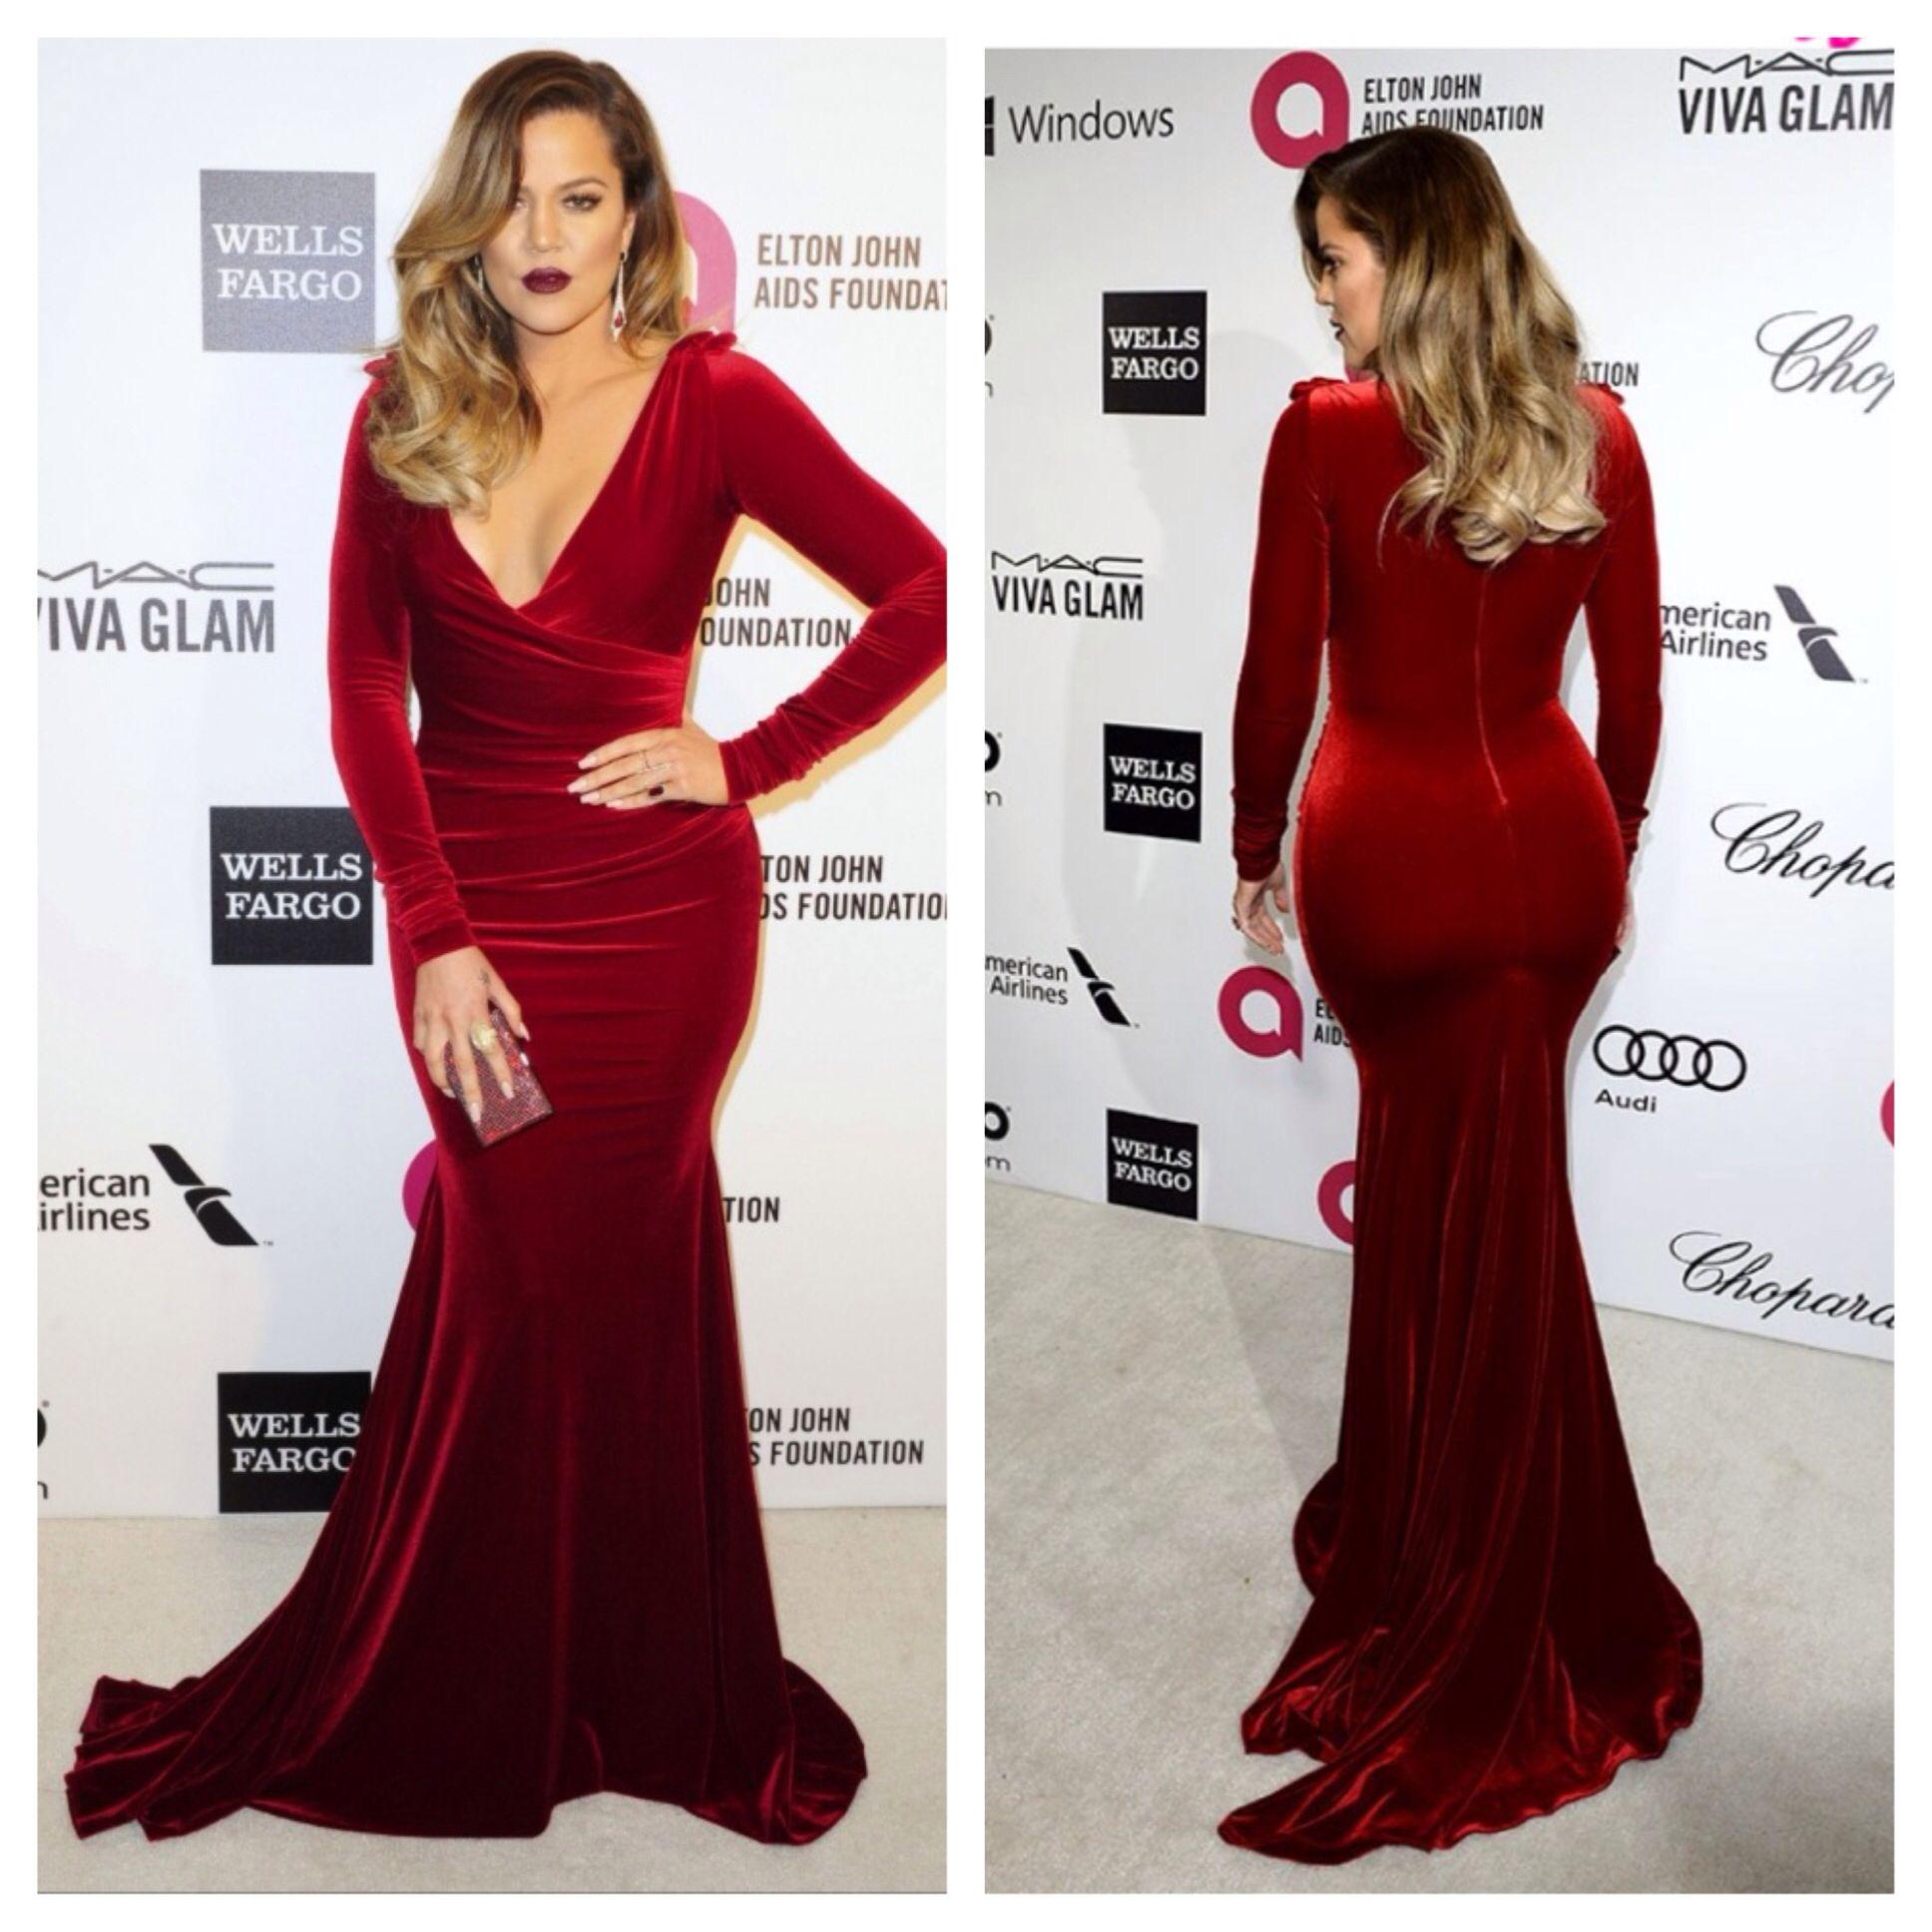 Chloe kardashian in a red velvet gown bridesmaid dresses